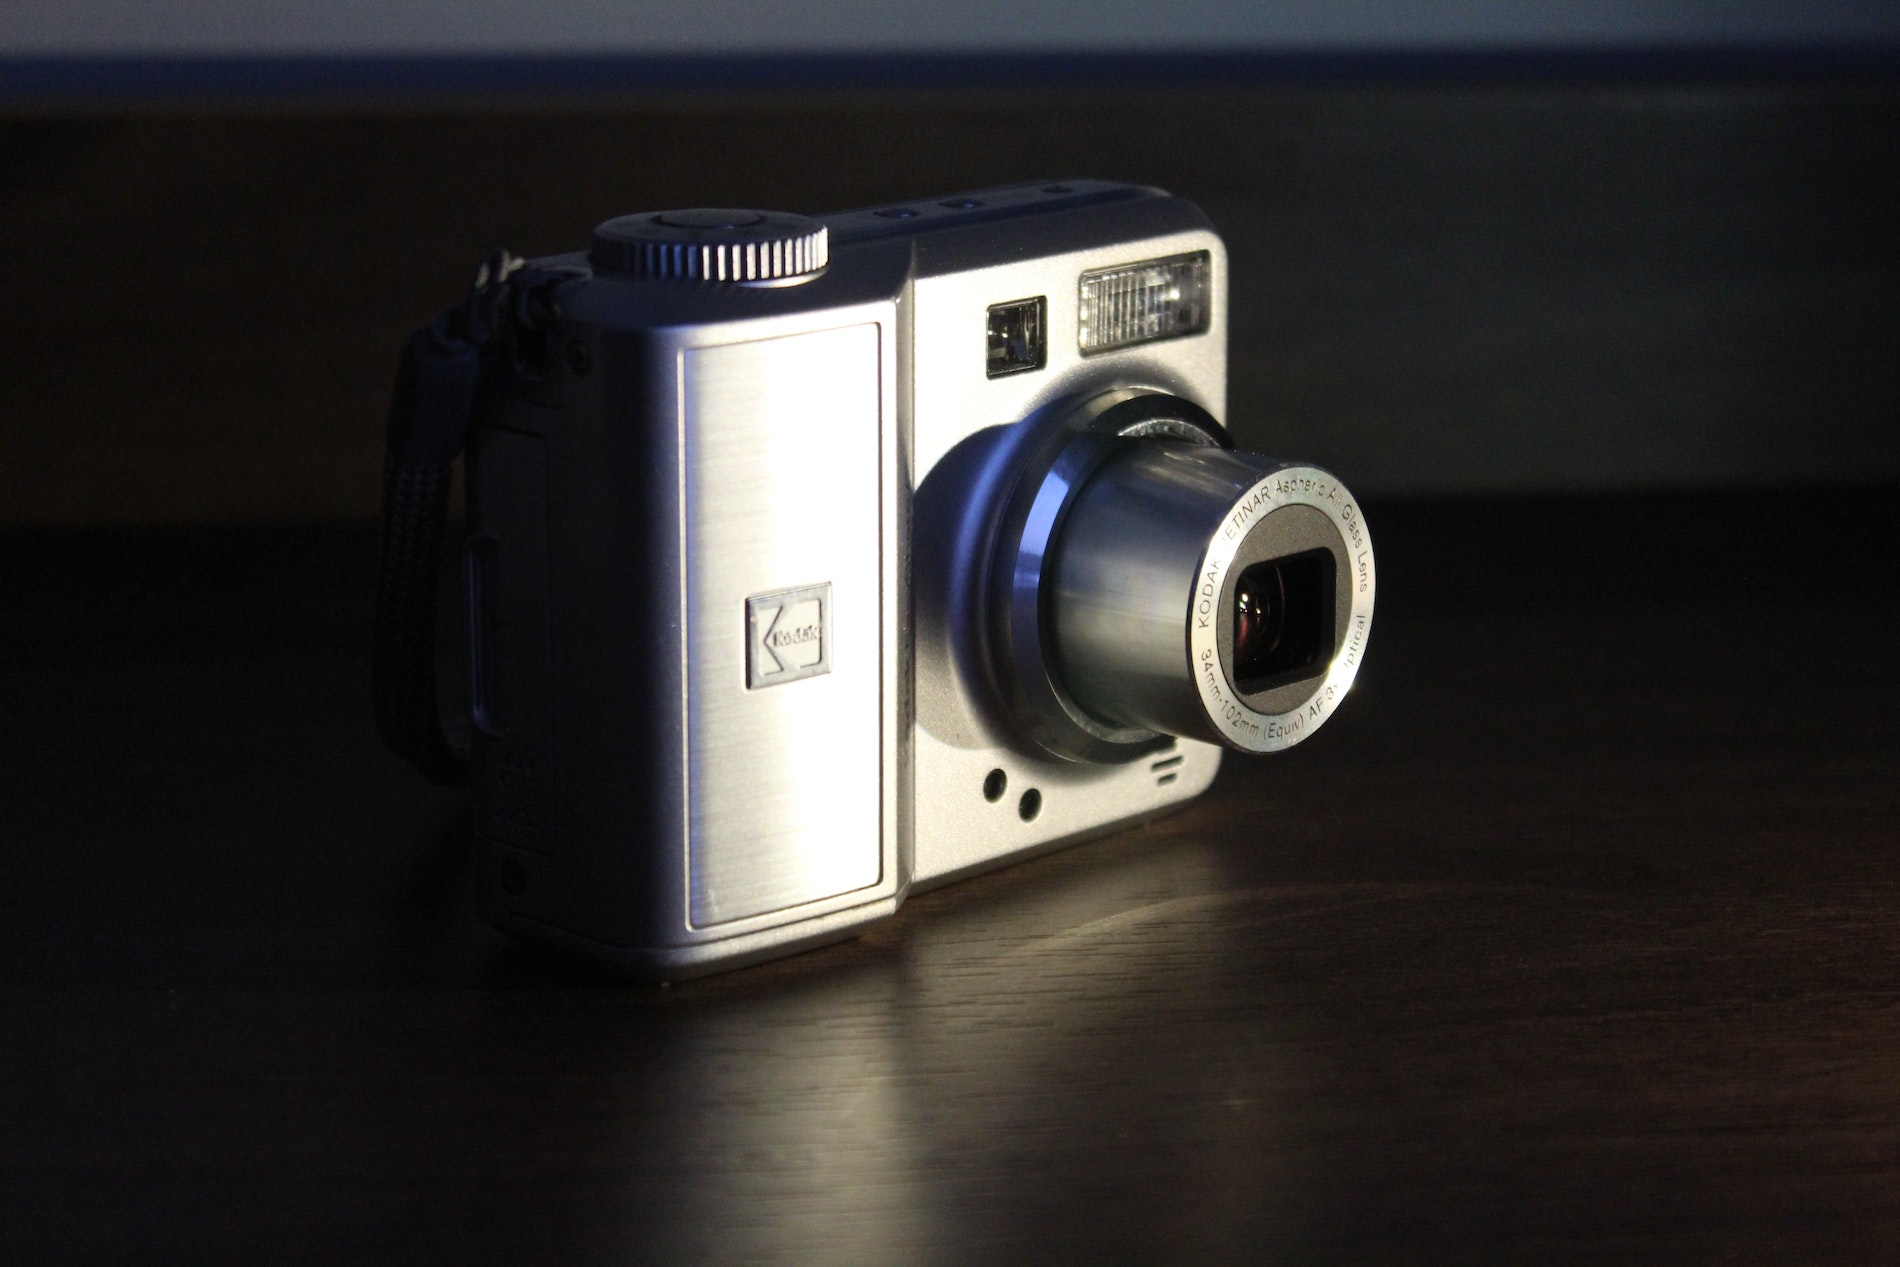 inexpensive digital camera